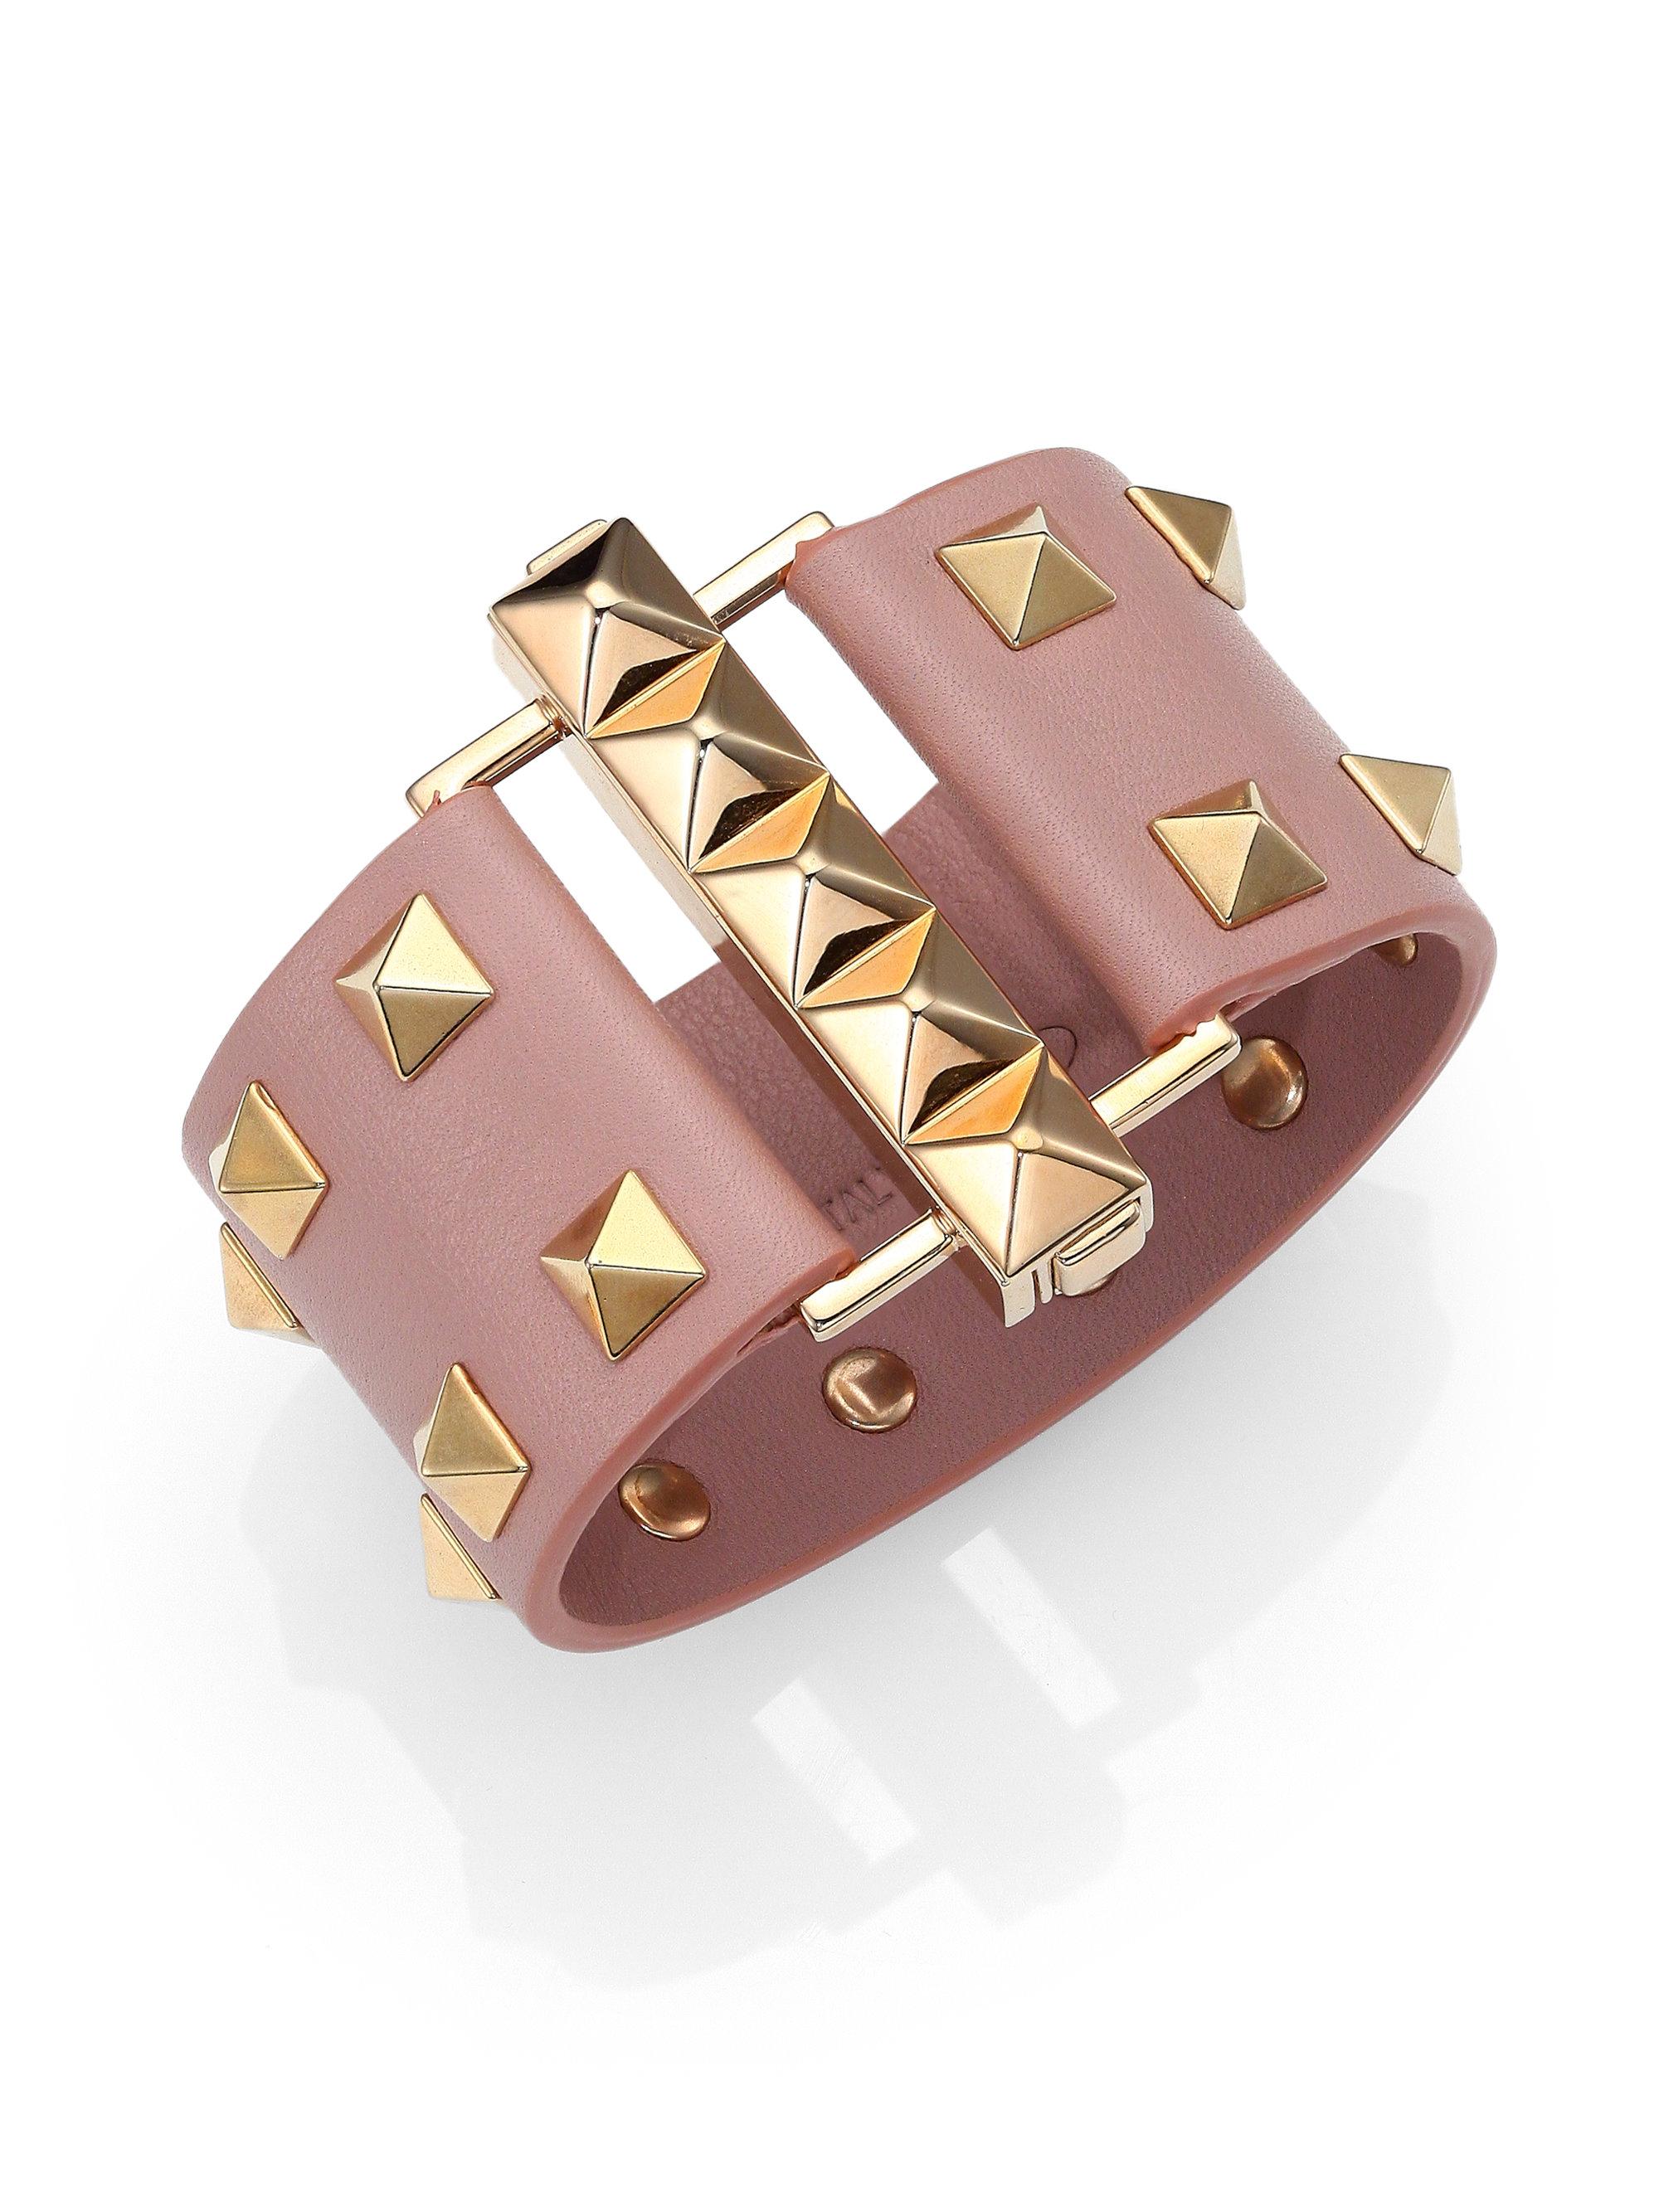 a451fbf4d Valentino Rockstud Wide Leather Cuff Bracelet in Pink - Lyst